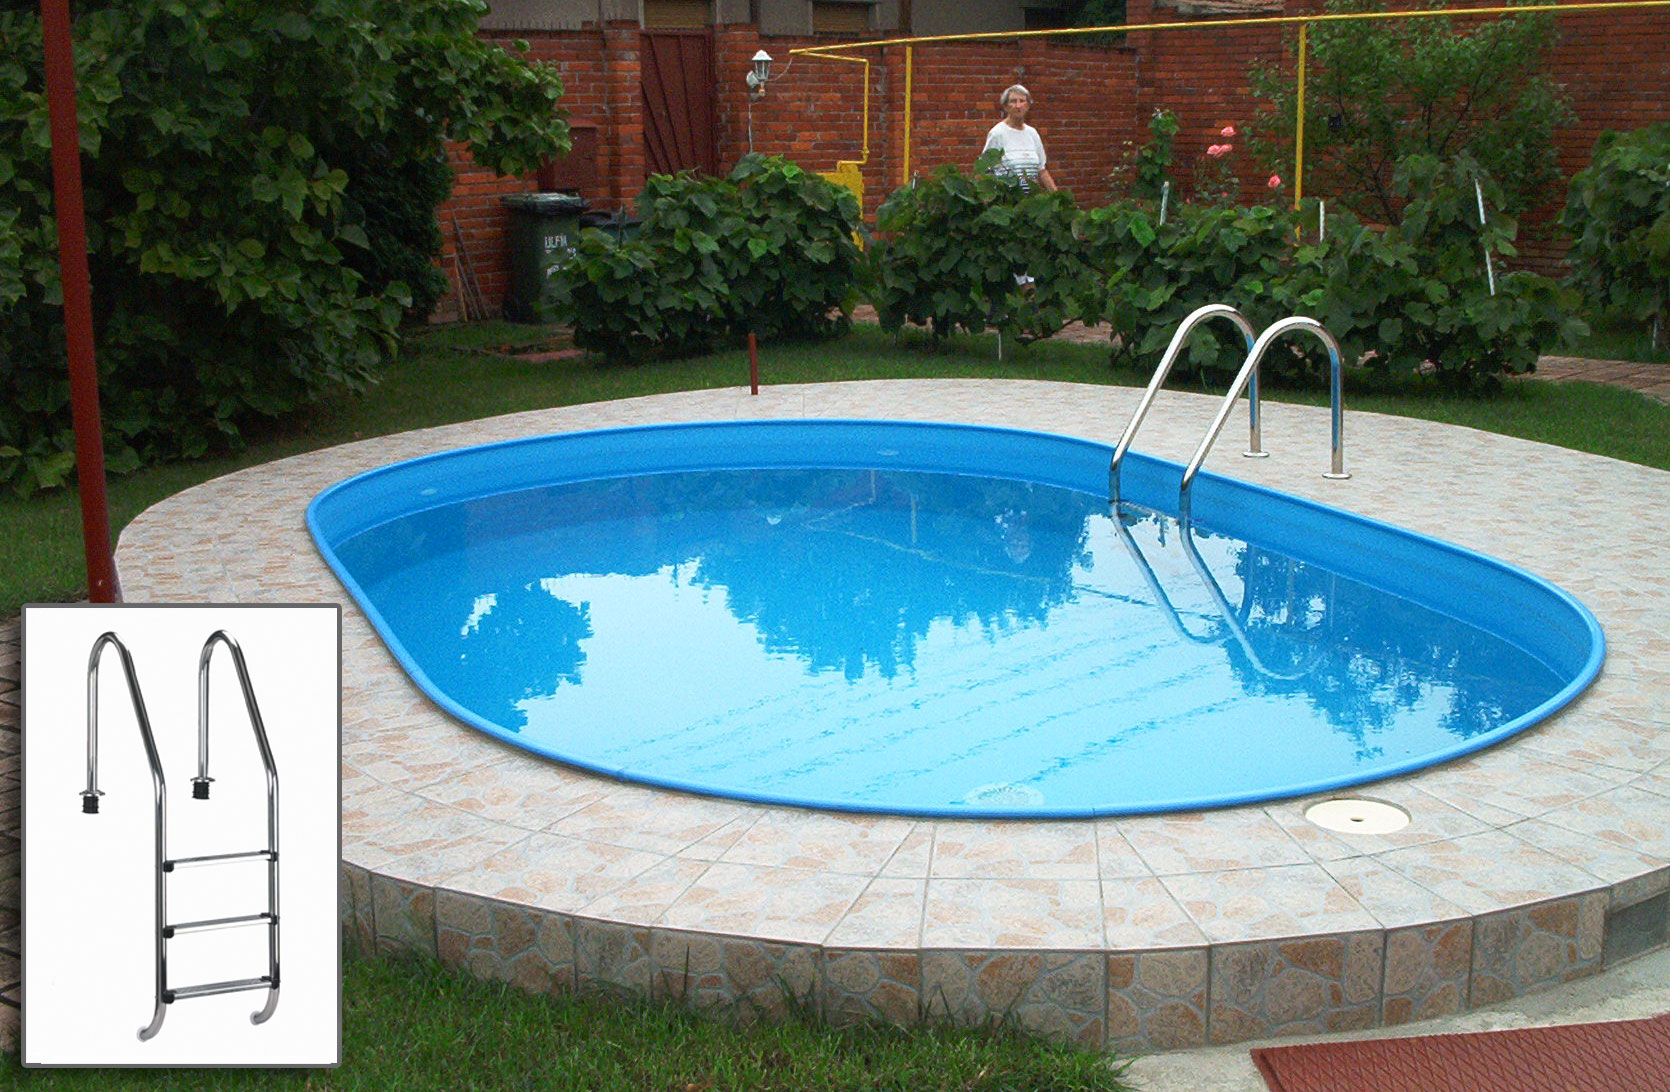 pool schwimmbecken premium oval set mit sandfilter 7x3. Black Bedroom Furniture Sets. Home Design Ideas